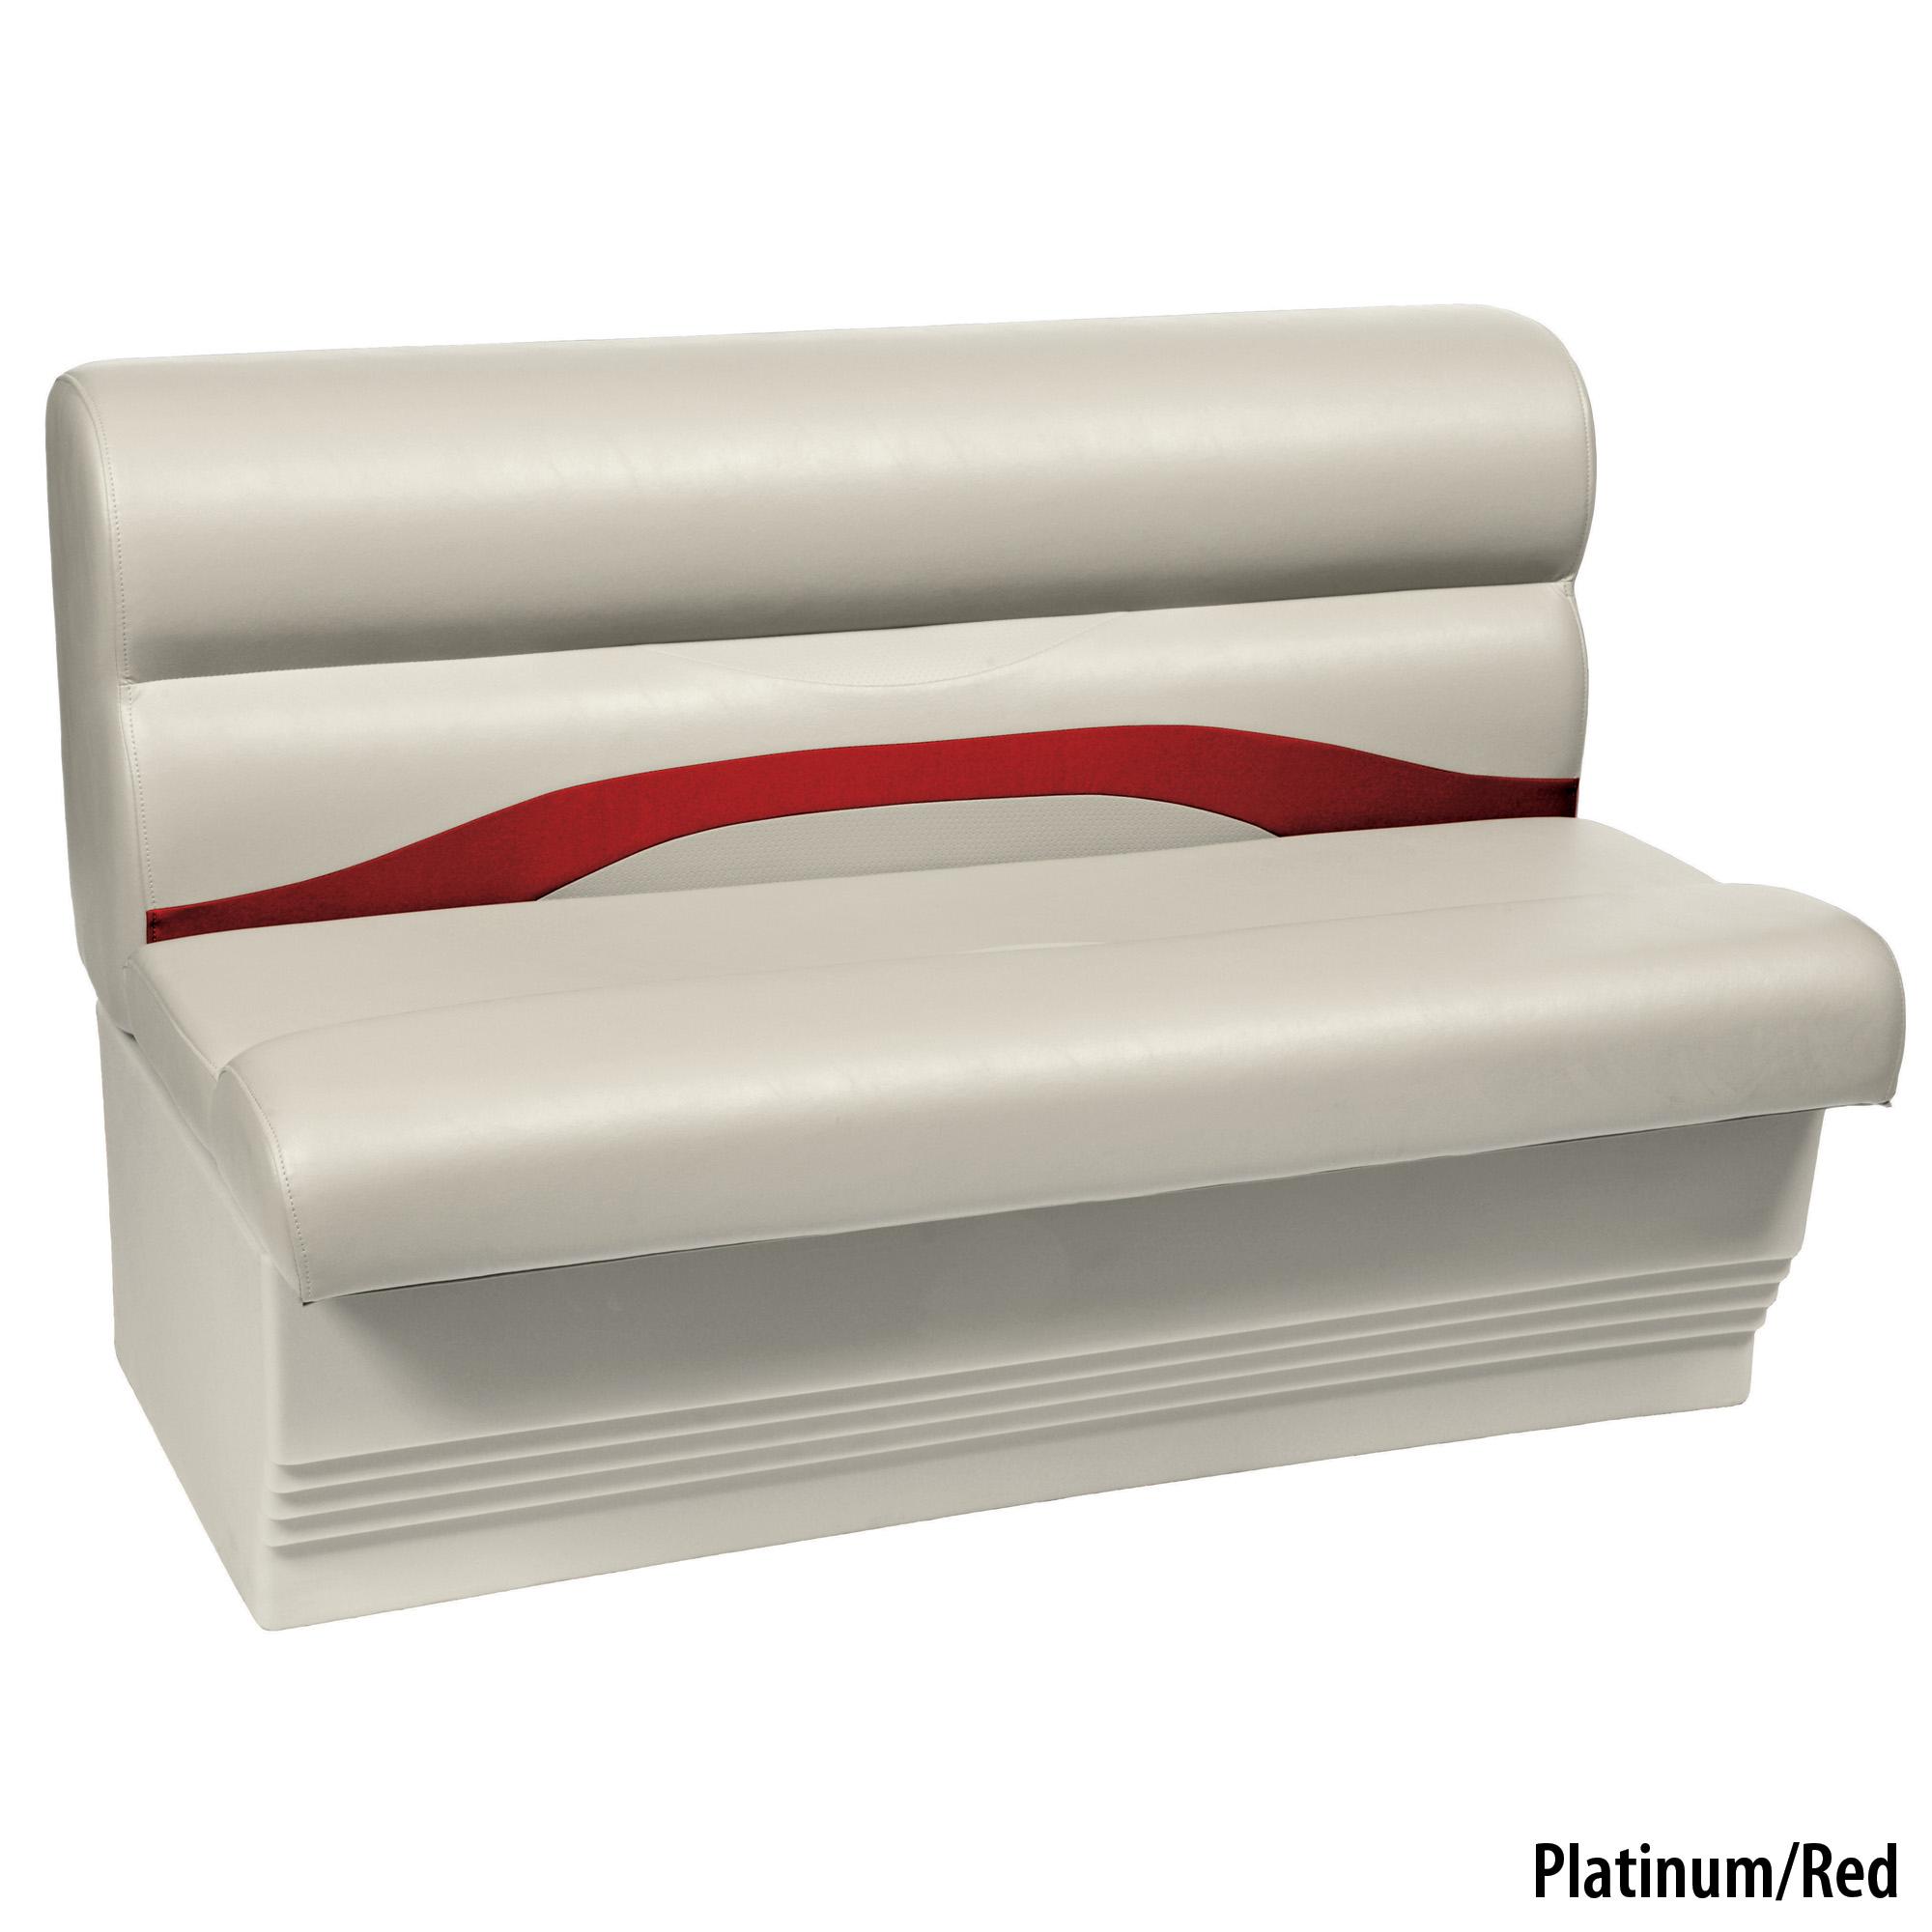 "Toonmate Premium Pontoon 45"" Wide Lounge Seat w/Platinum Base"